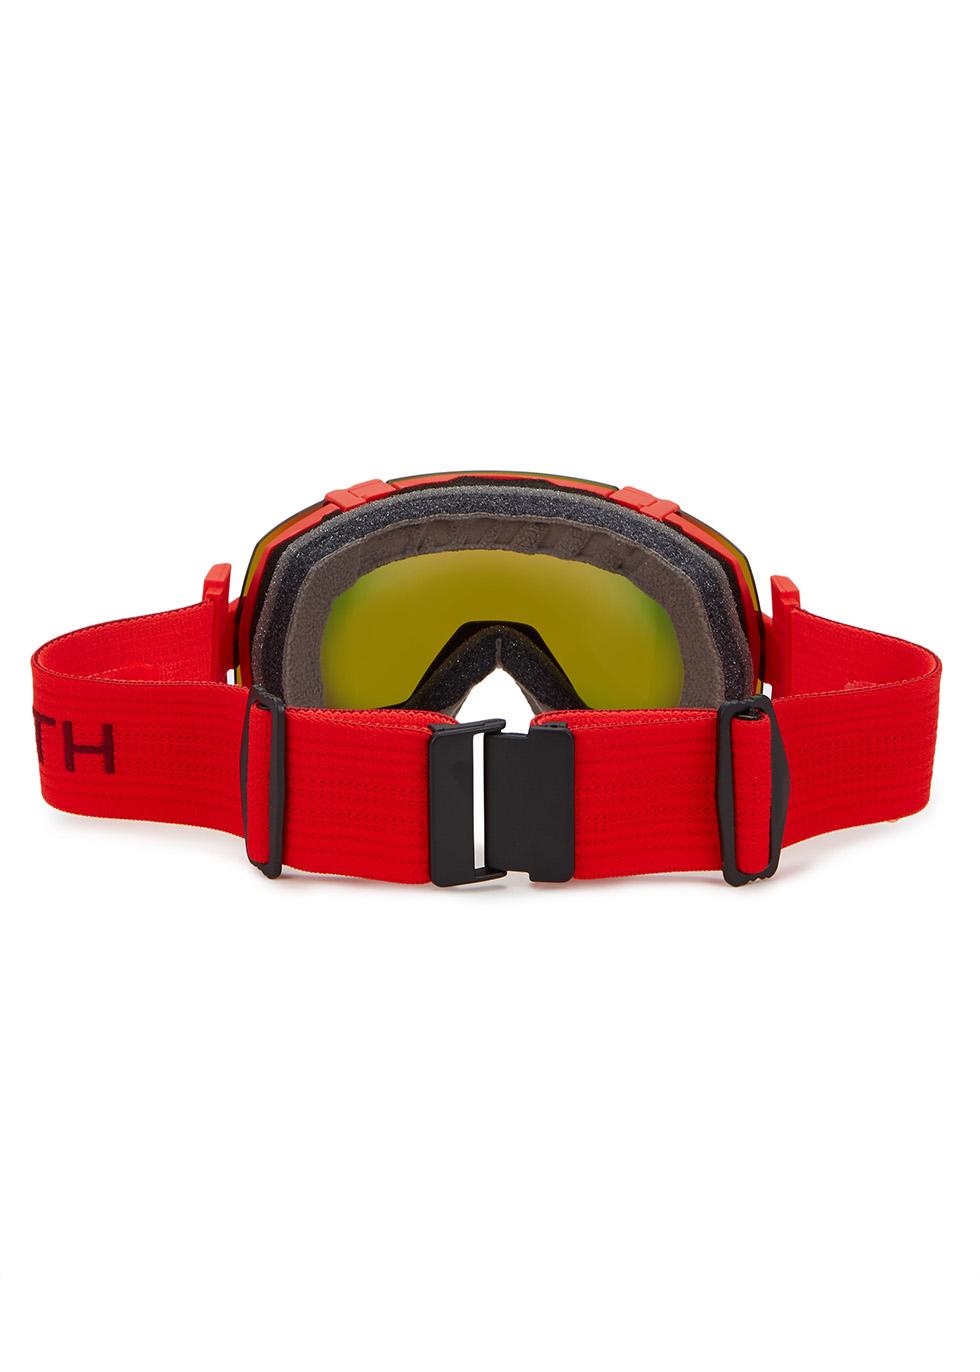 I/OX red ski goggles - SMITH